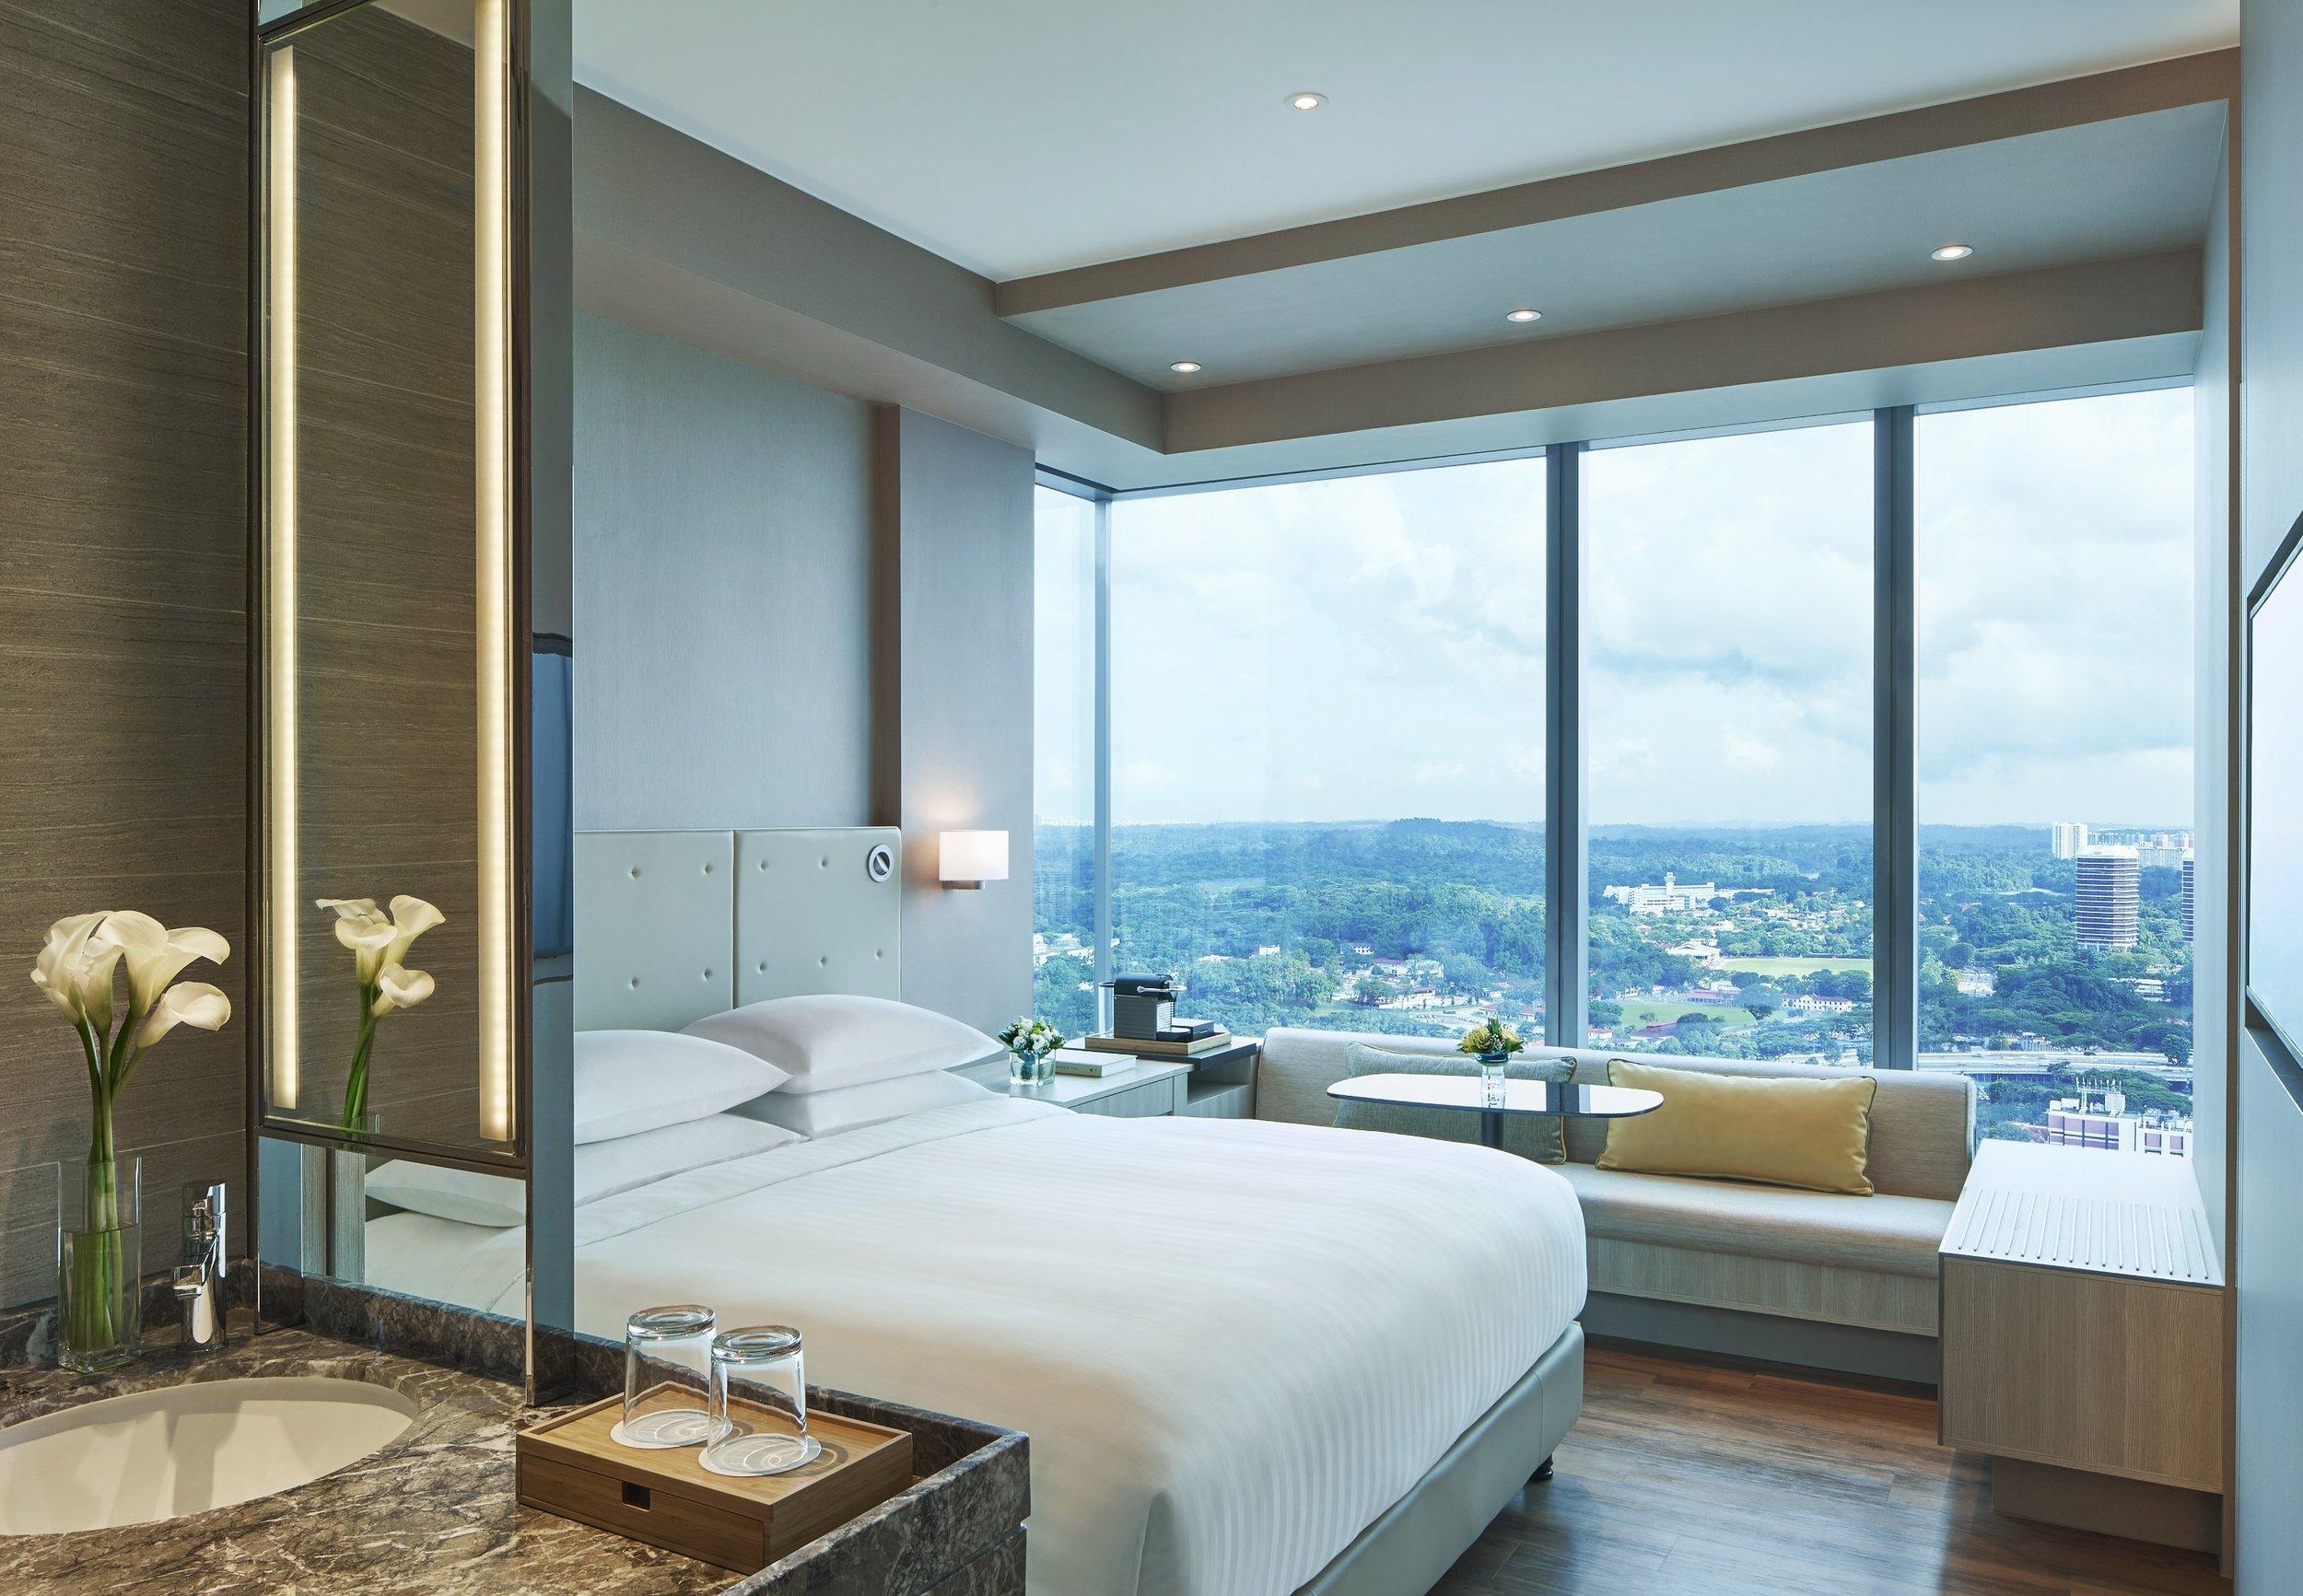 Executive Corner Room | Photo Credit: Courtyard by Marriott Singapore Novena